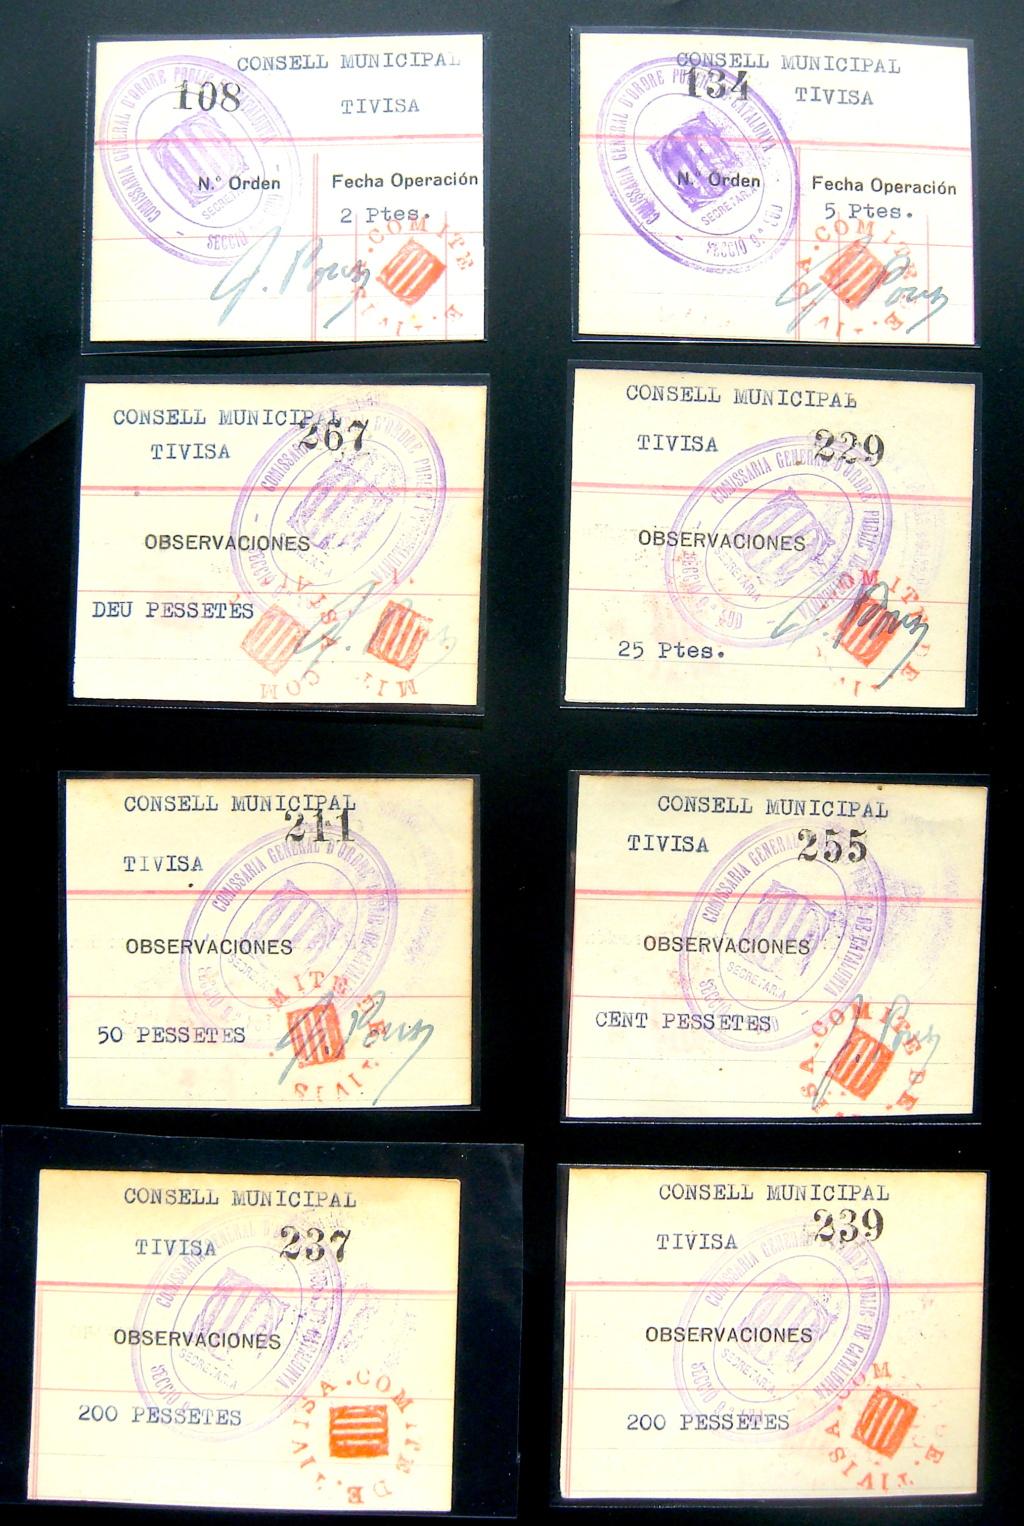 50 Pessetes Tivissa, 1937 (RRRR) Dsc05055